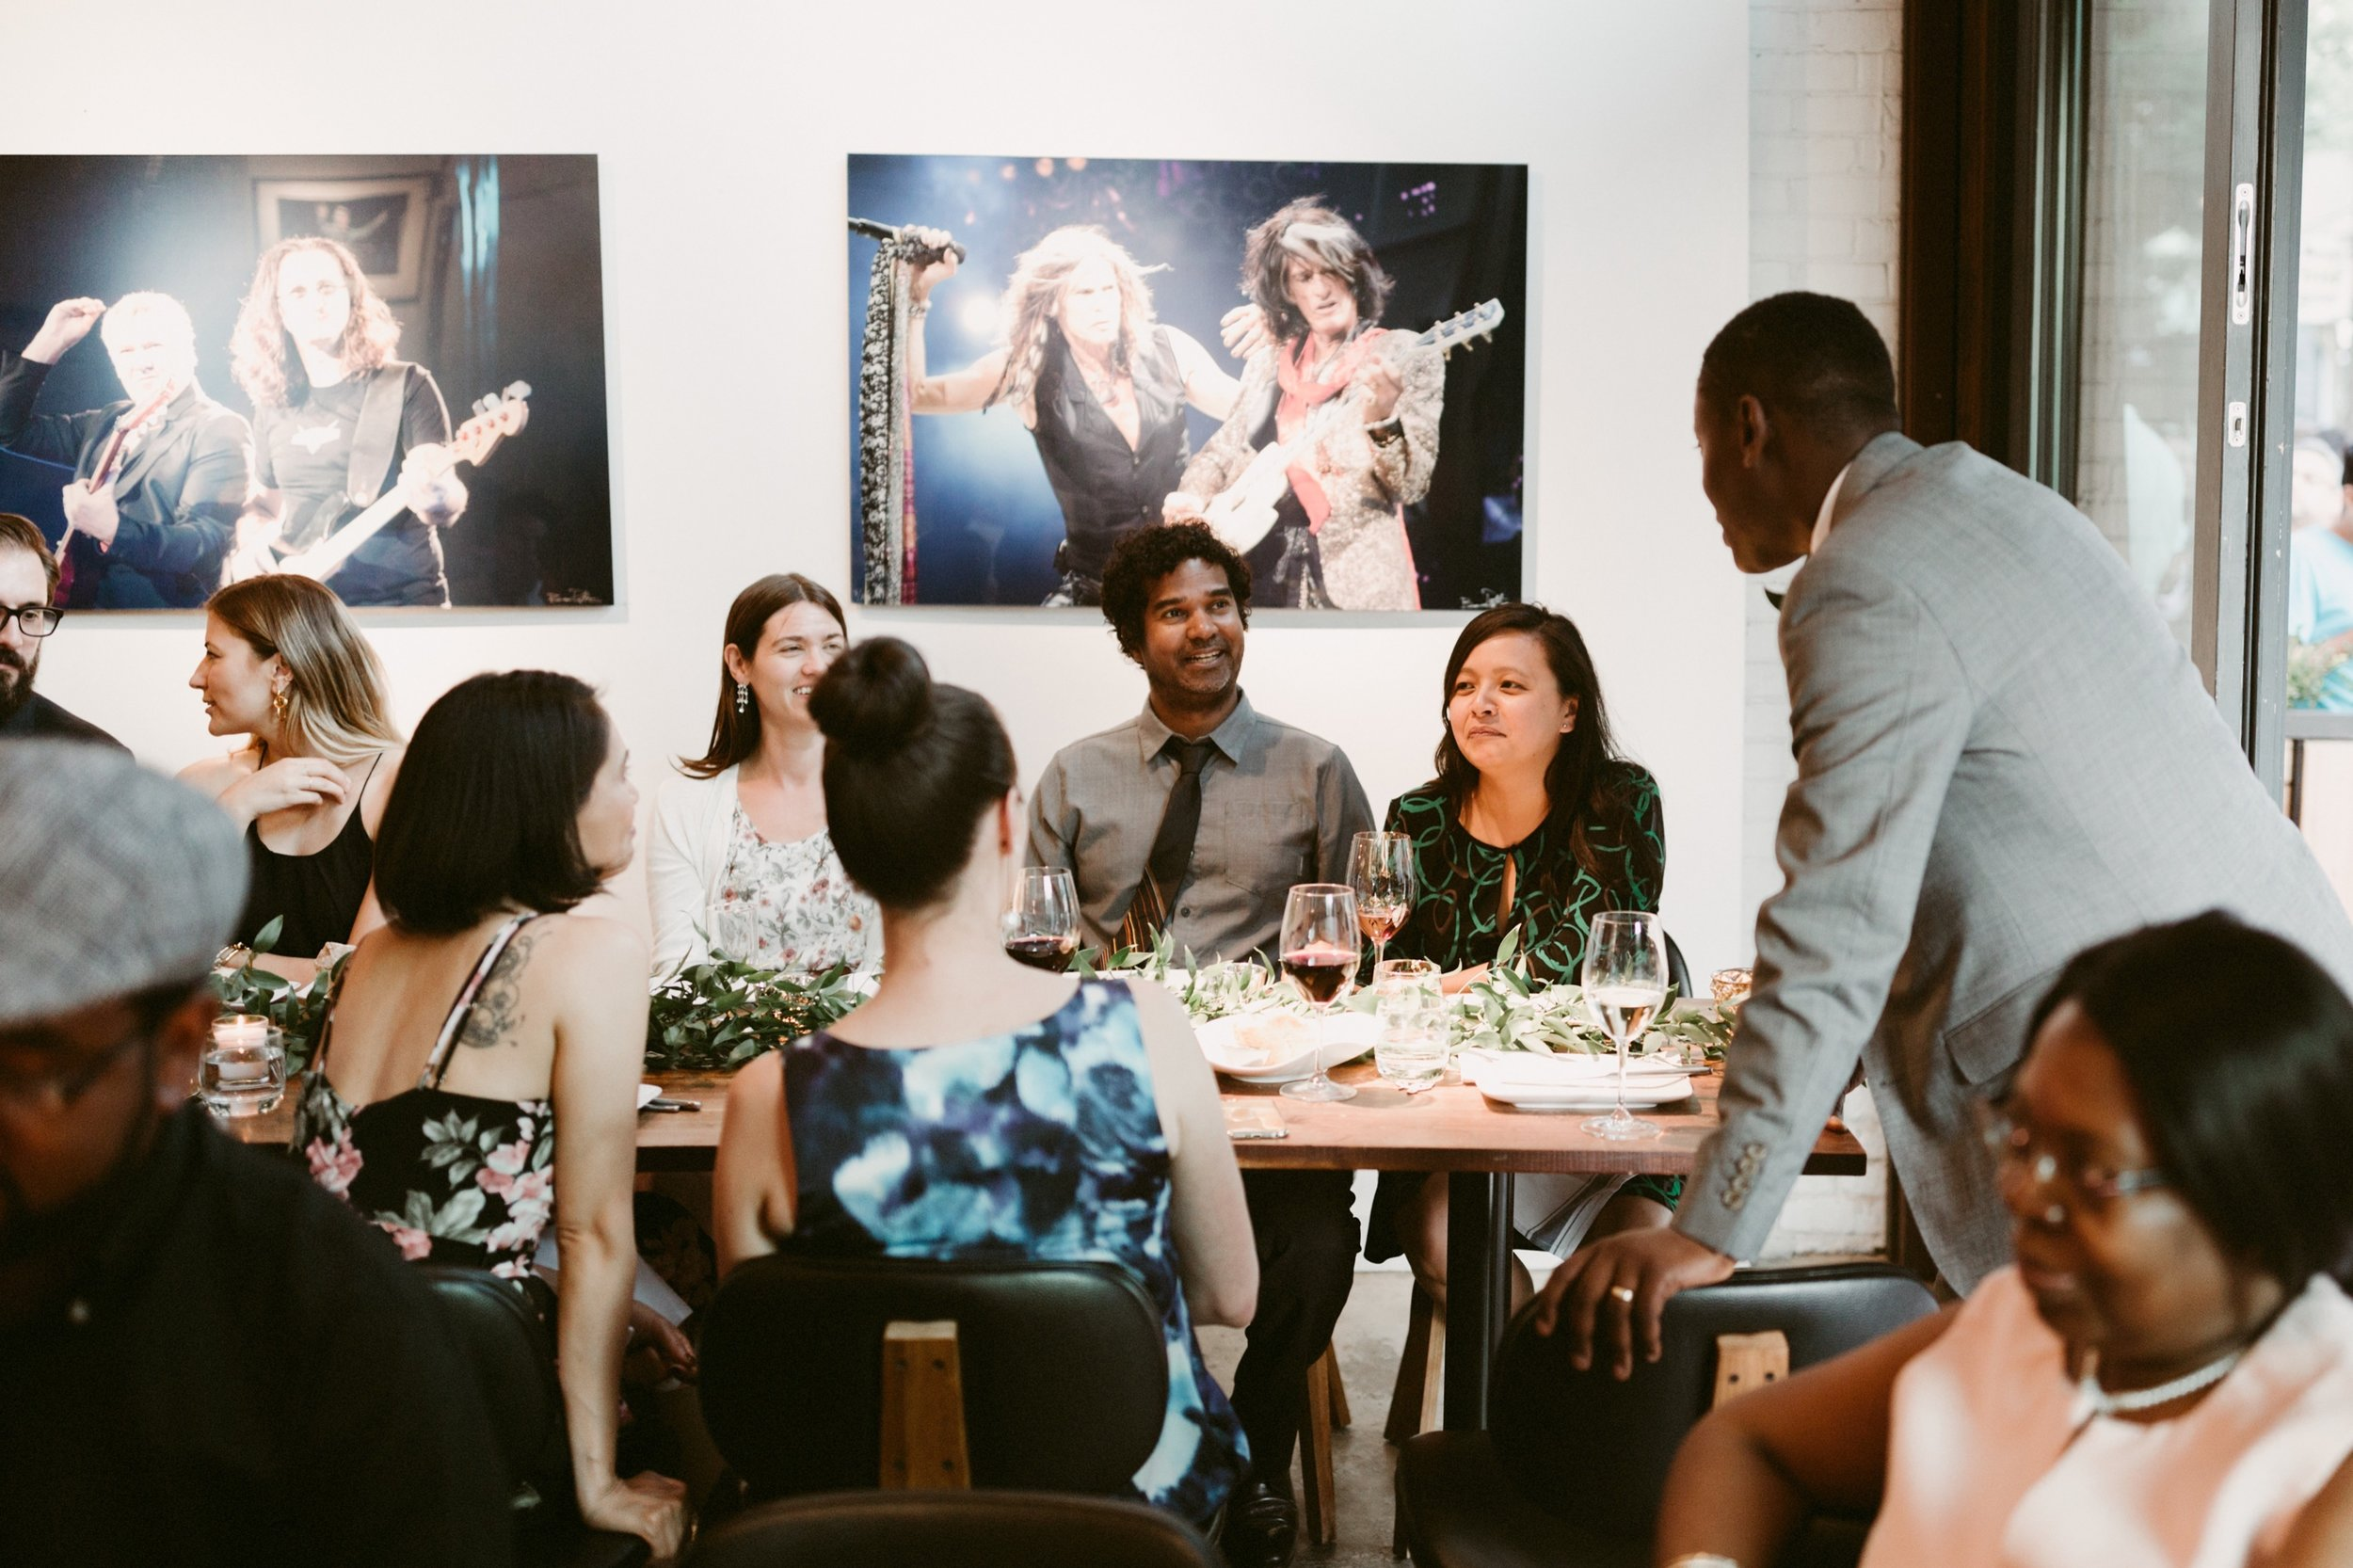 077_Spadina House Wedding (471 of 748)_intimate_Boehmer_Restaurant_Toronto_Wedding.jpg